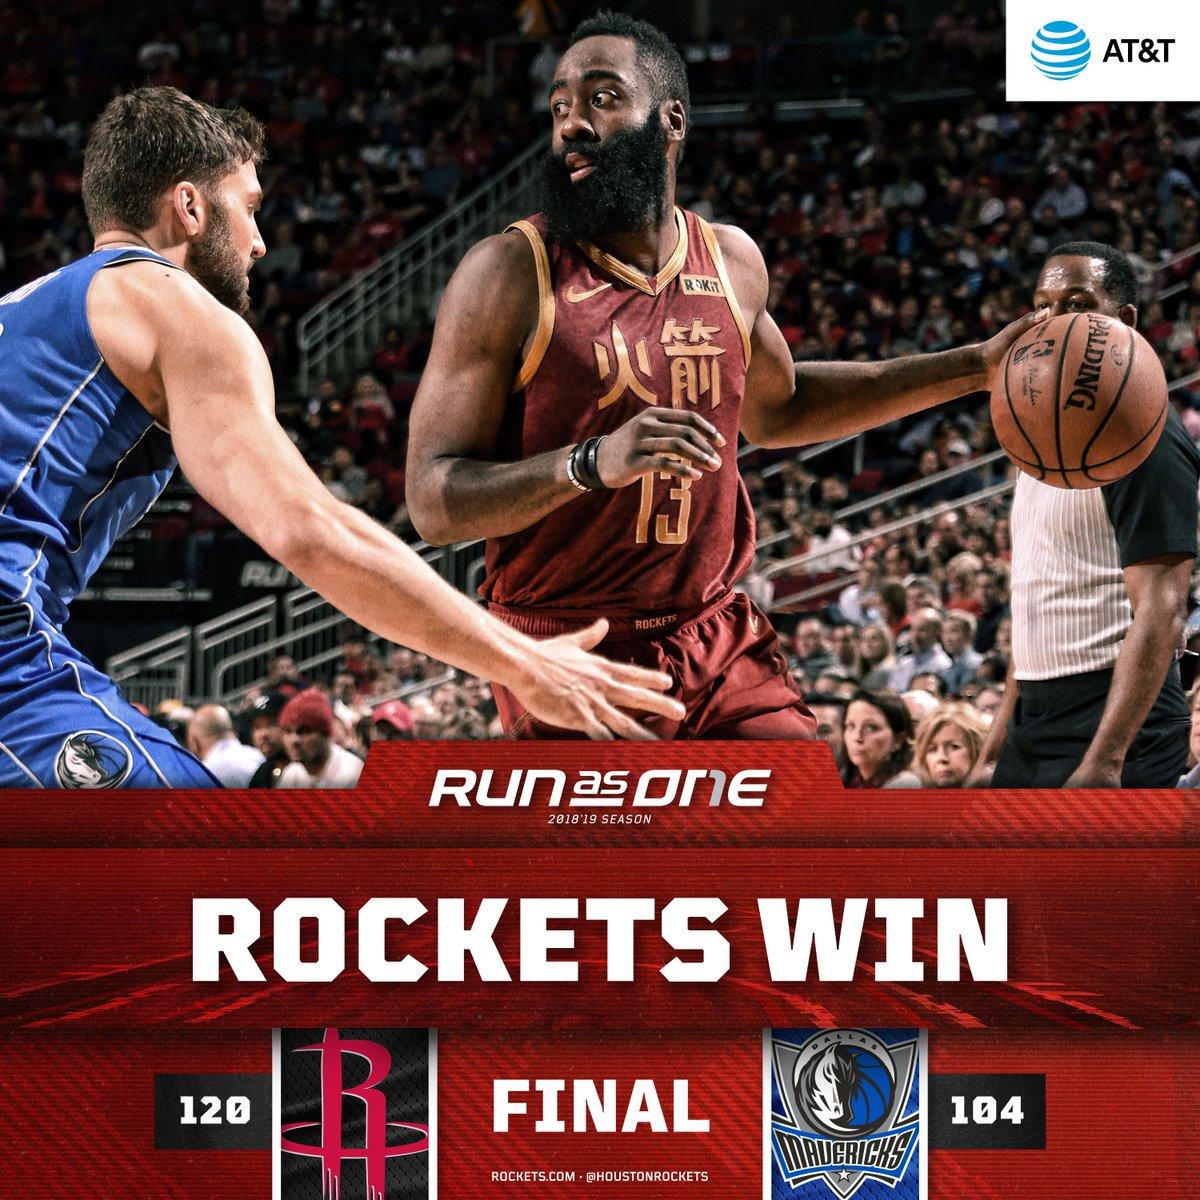 Rockets Win Big in H-Town!   #RunAsOne 🚀